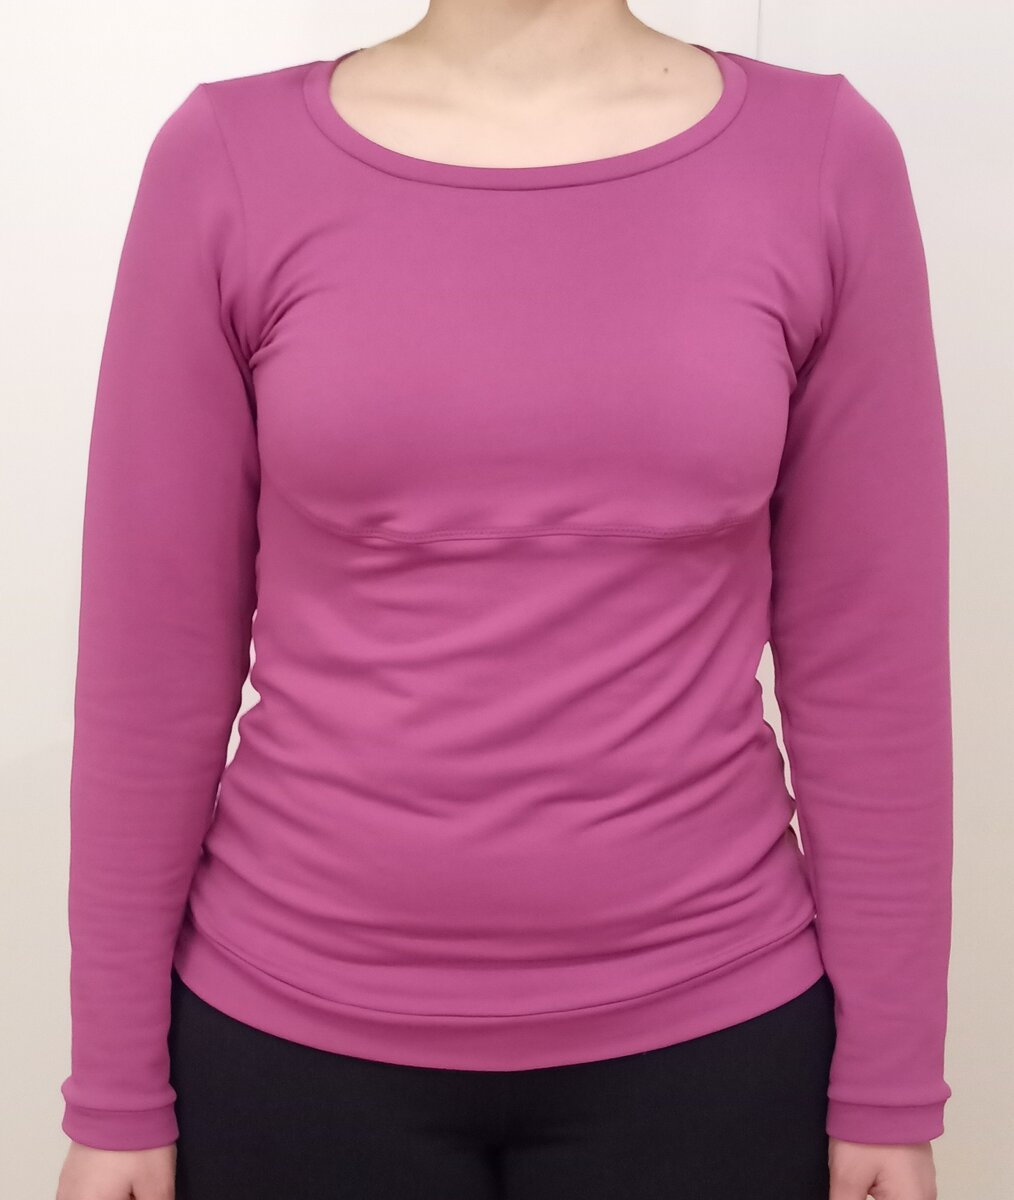 Missy Sportshirt (1)